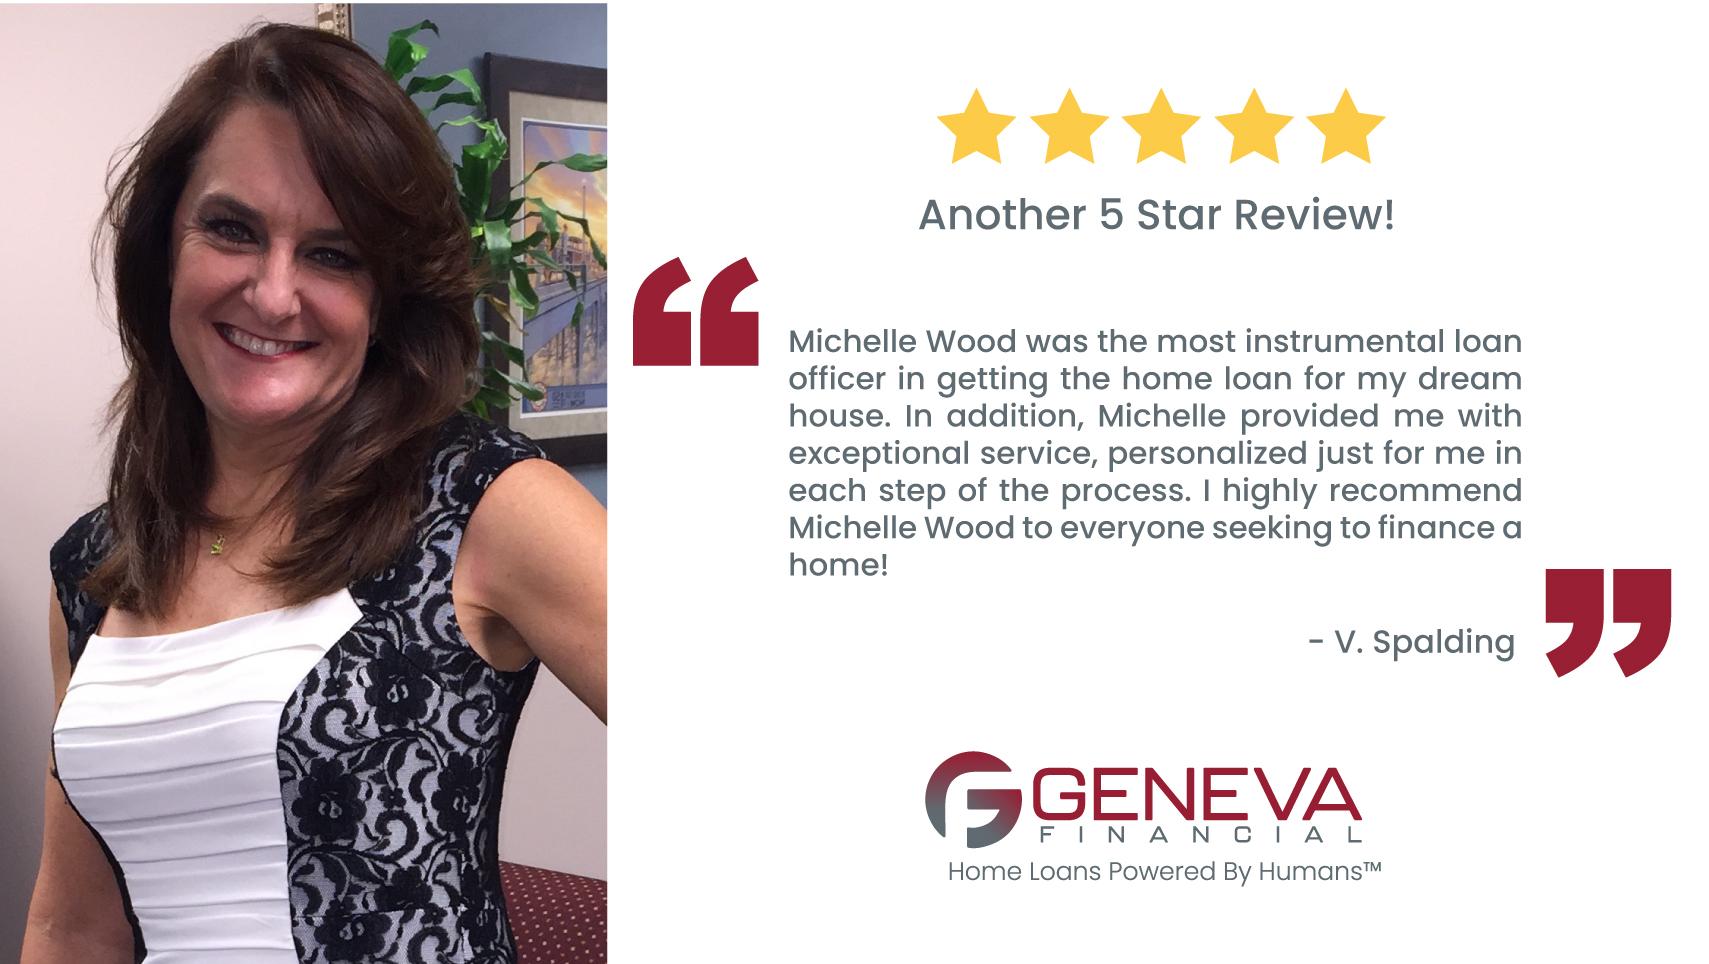 Michelle Wood Loan Officer Temecula, California